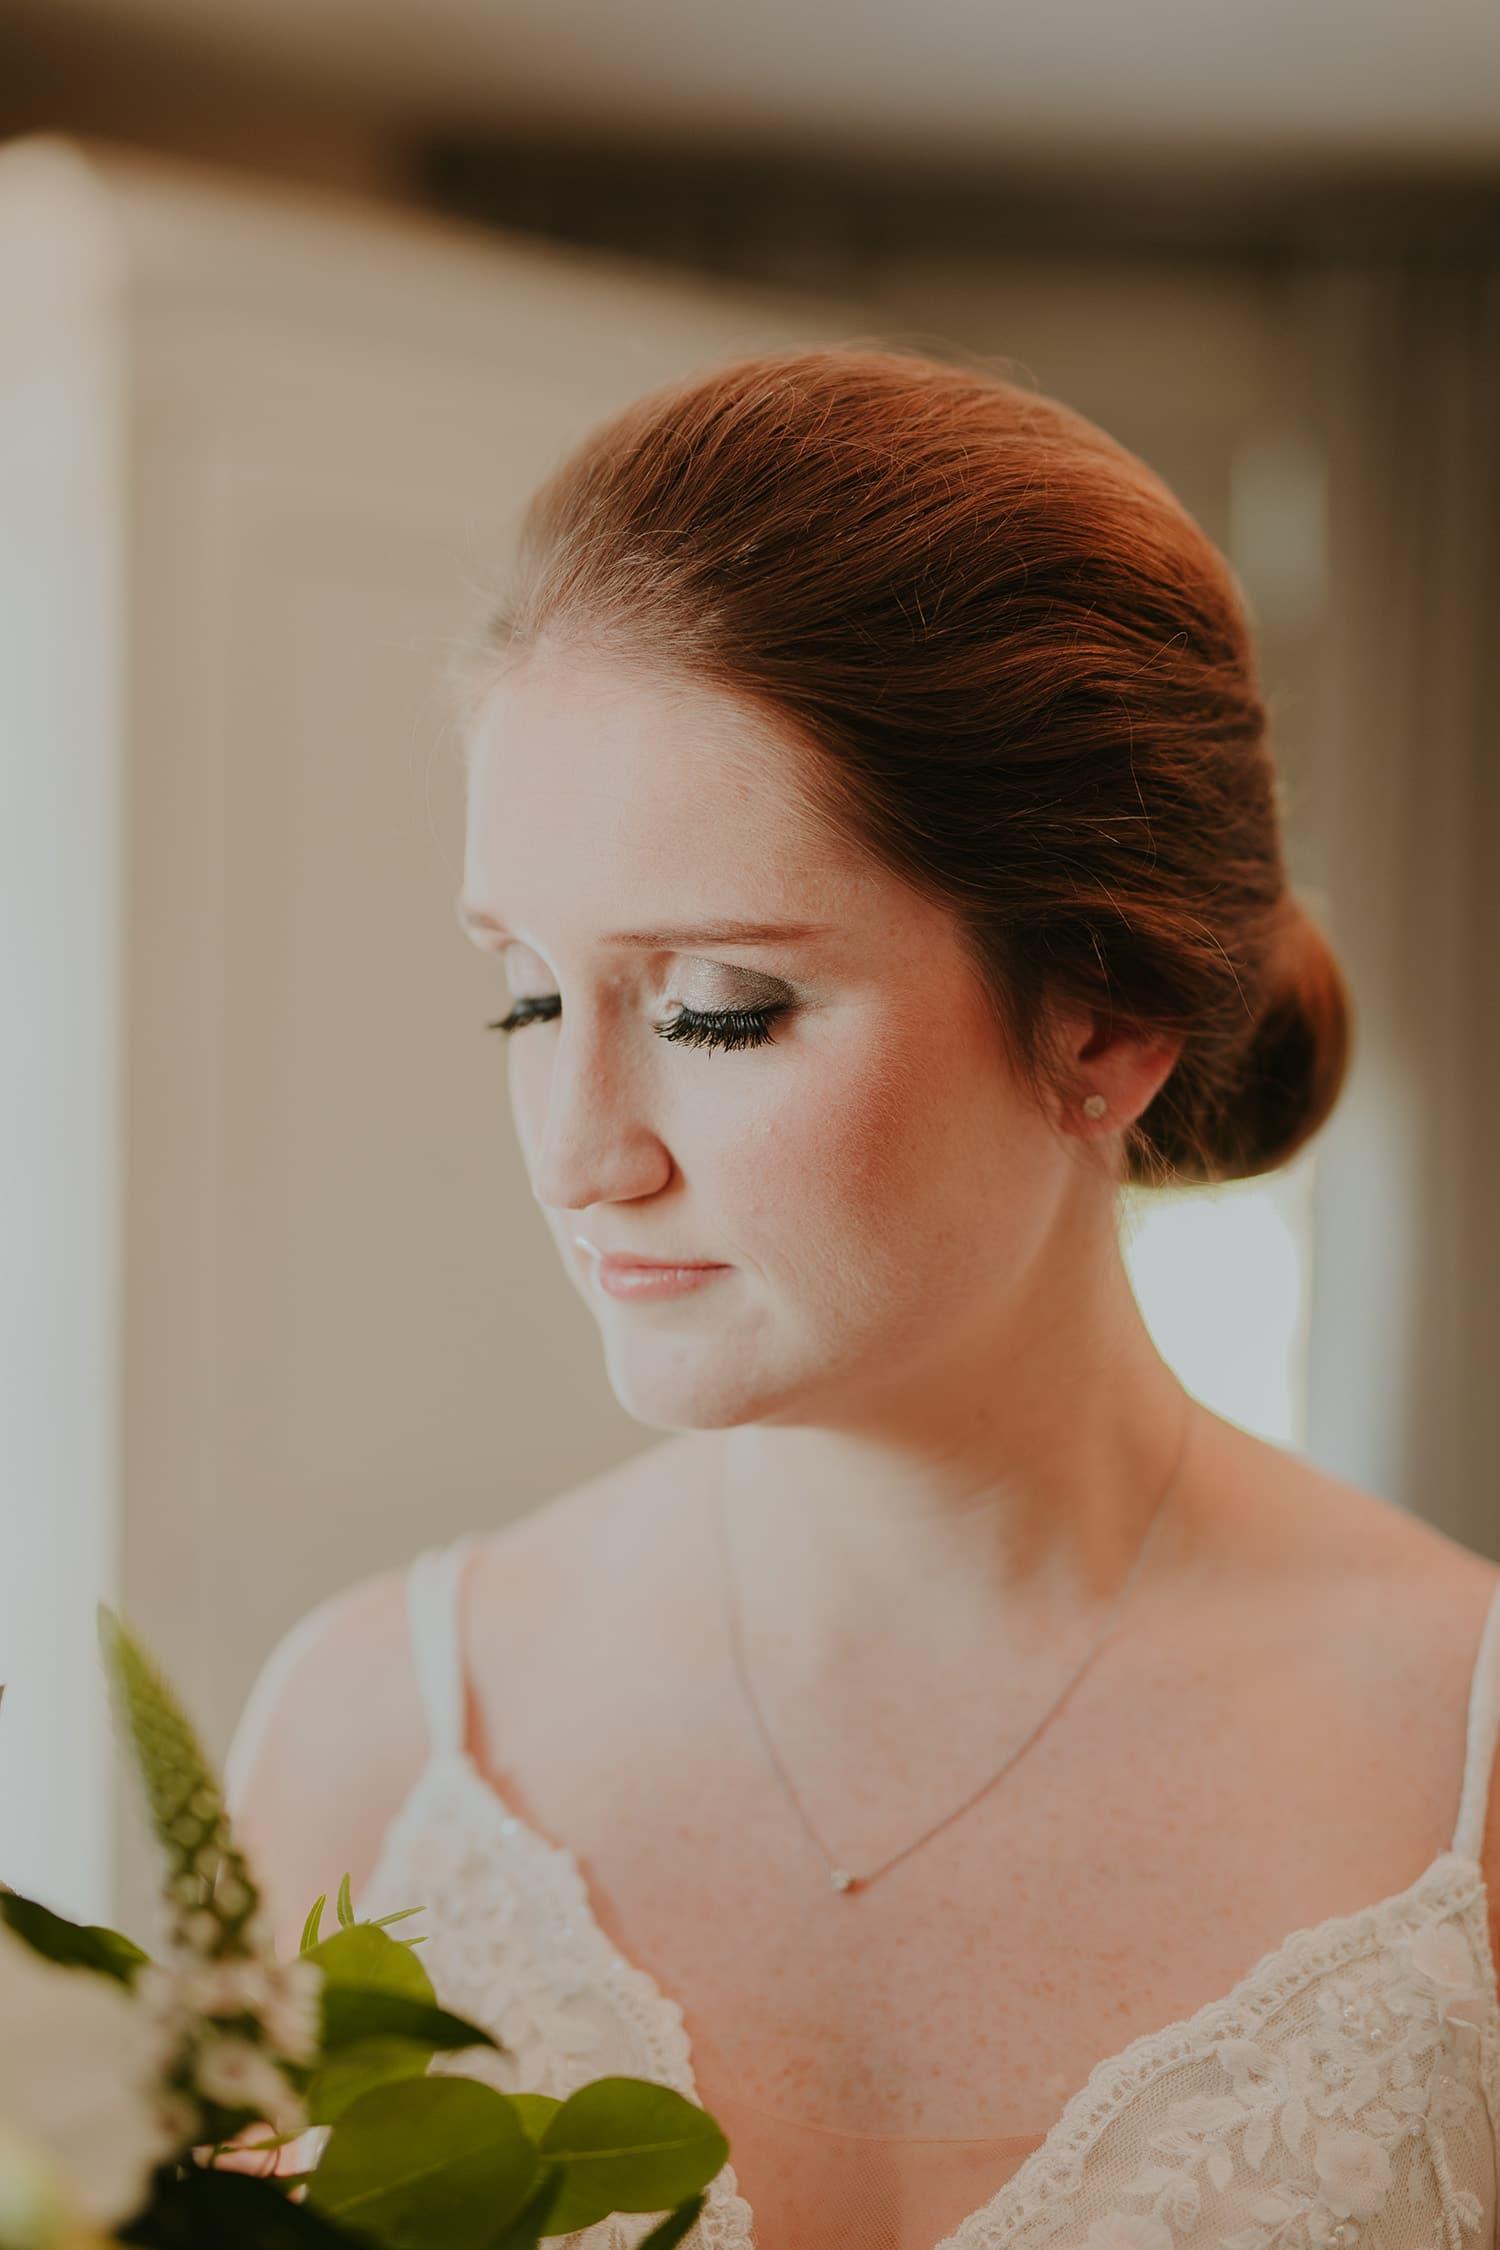 WEDDING VENDORS - ZORGVLIET WEDDING - ZORGVLIET WINES - STELLENBOSCH - TOP WEDDING PHOTOGRAPHERS CAPE TOWN - DUANE SMITH PHOTOGRAPHY - JESSICA & LEON - MARRIED-58